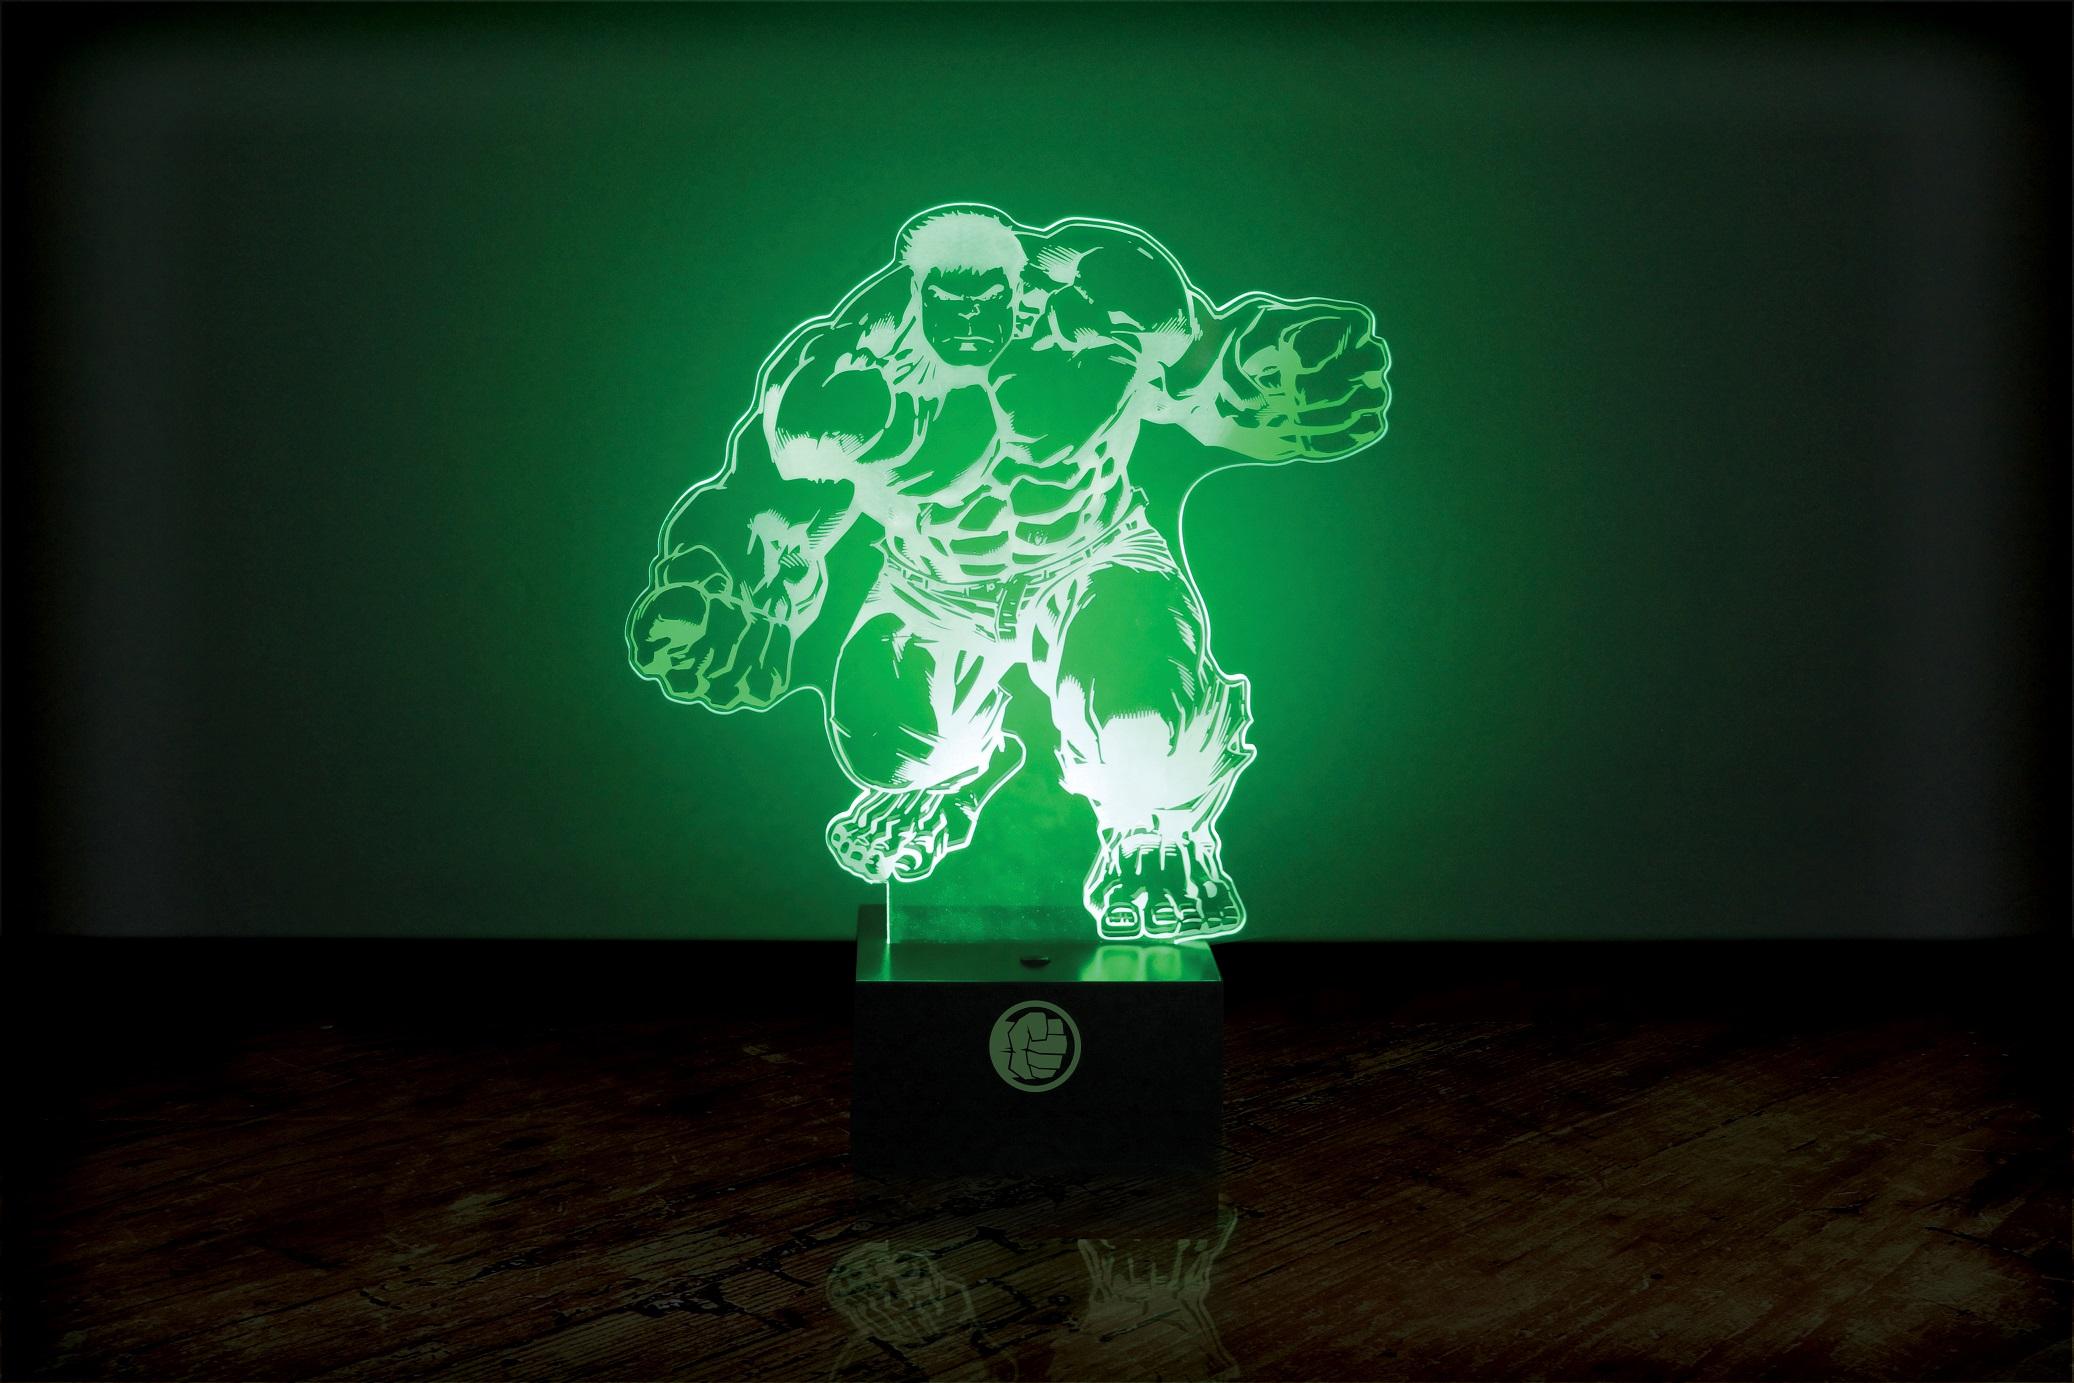 Superman Lampskärm Logga presentpresenttips